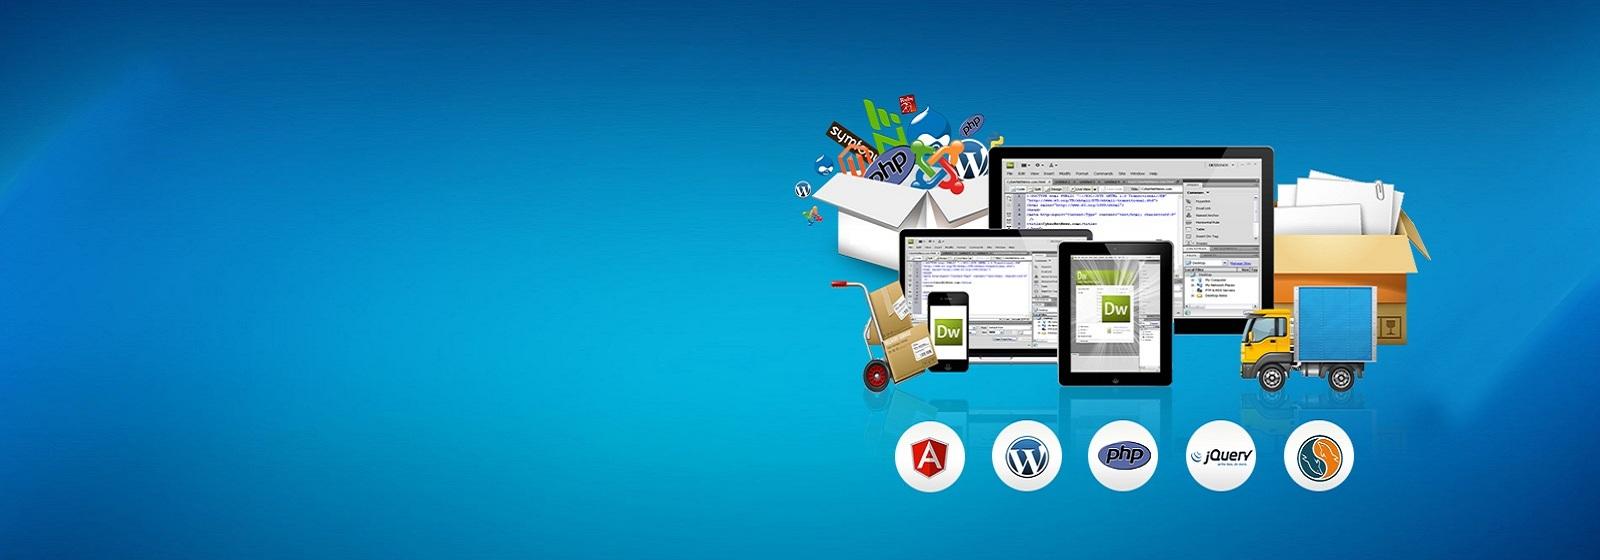 web-development-service-in-rishikesh